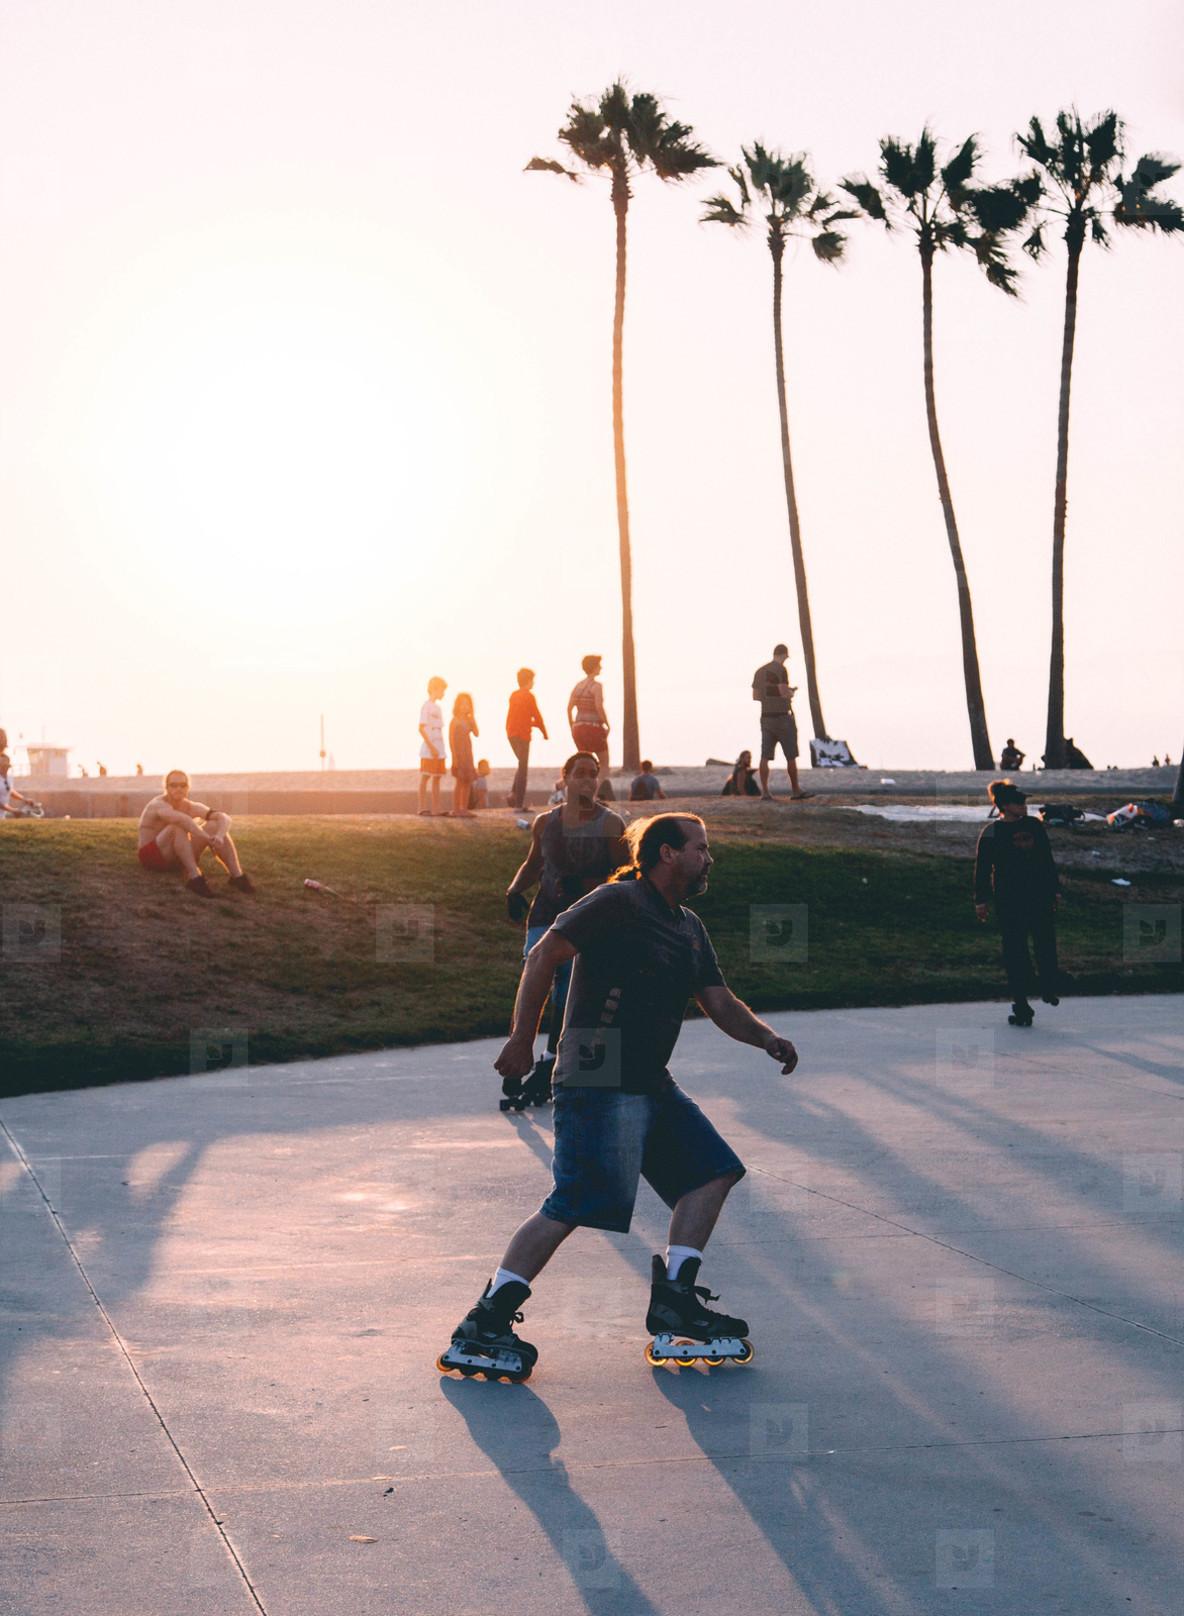 Rollerblading in California